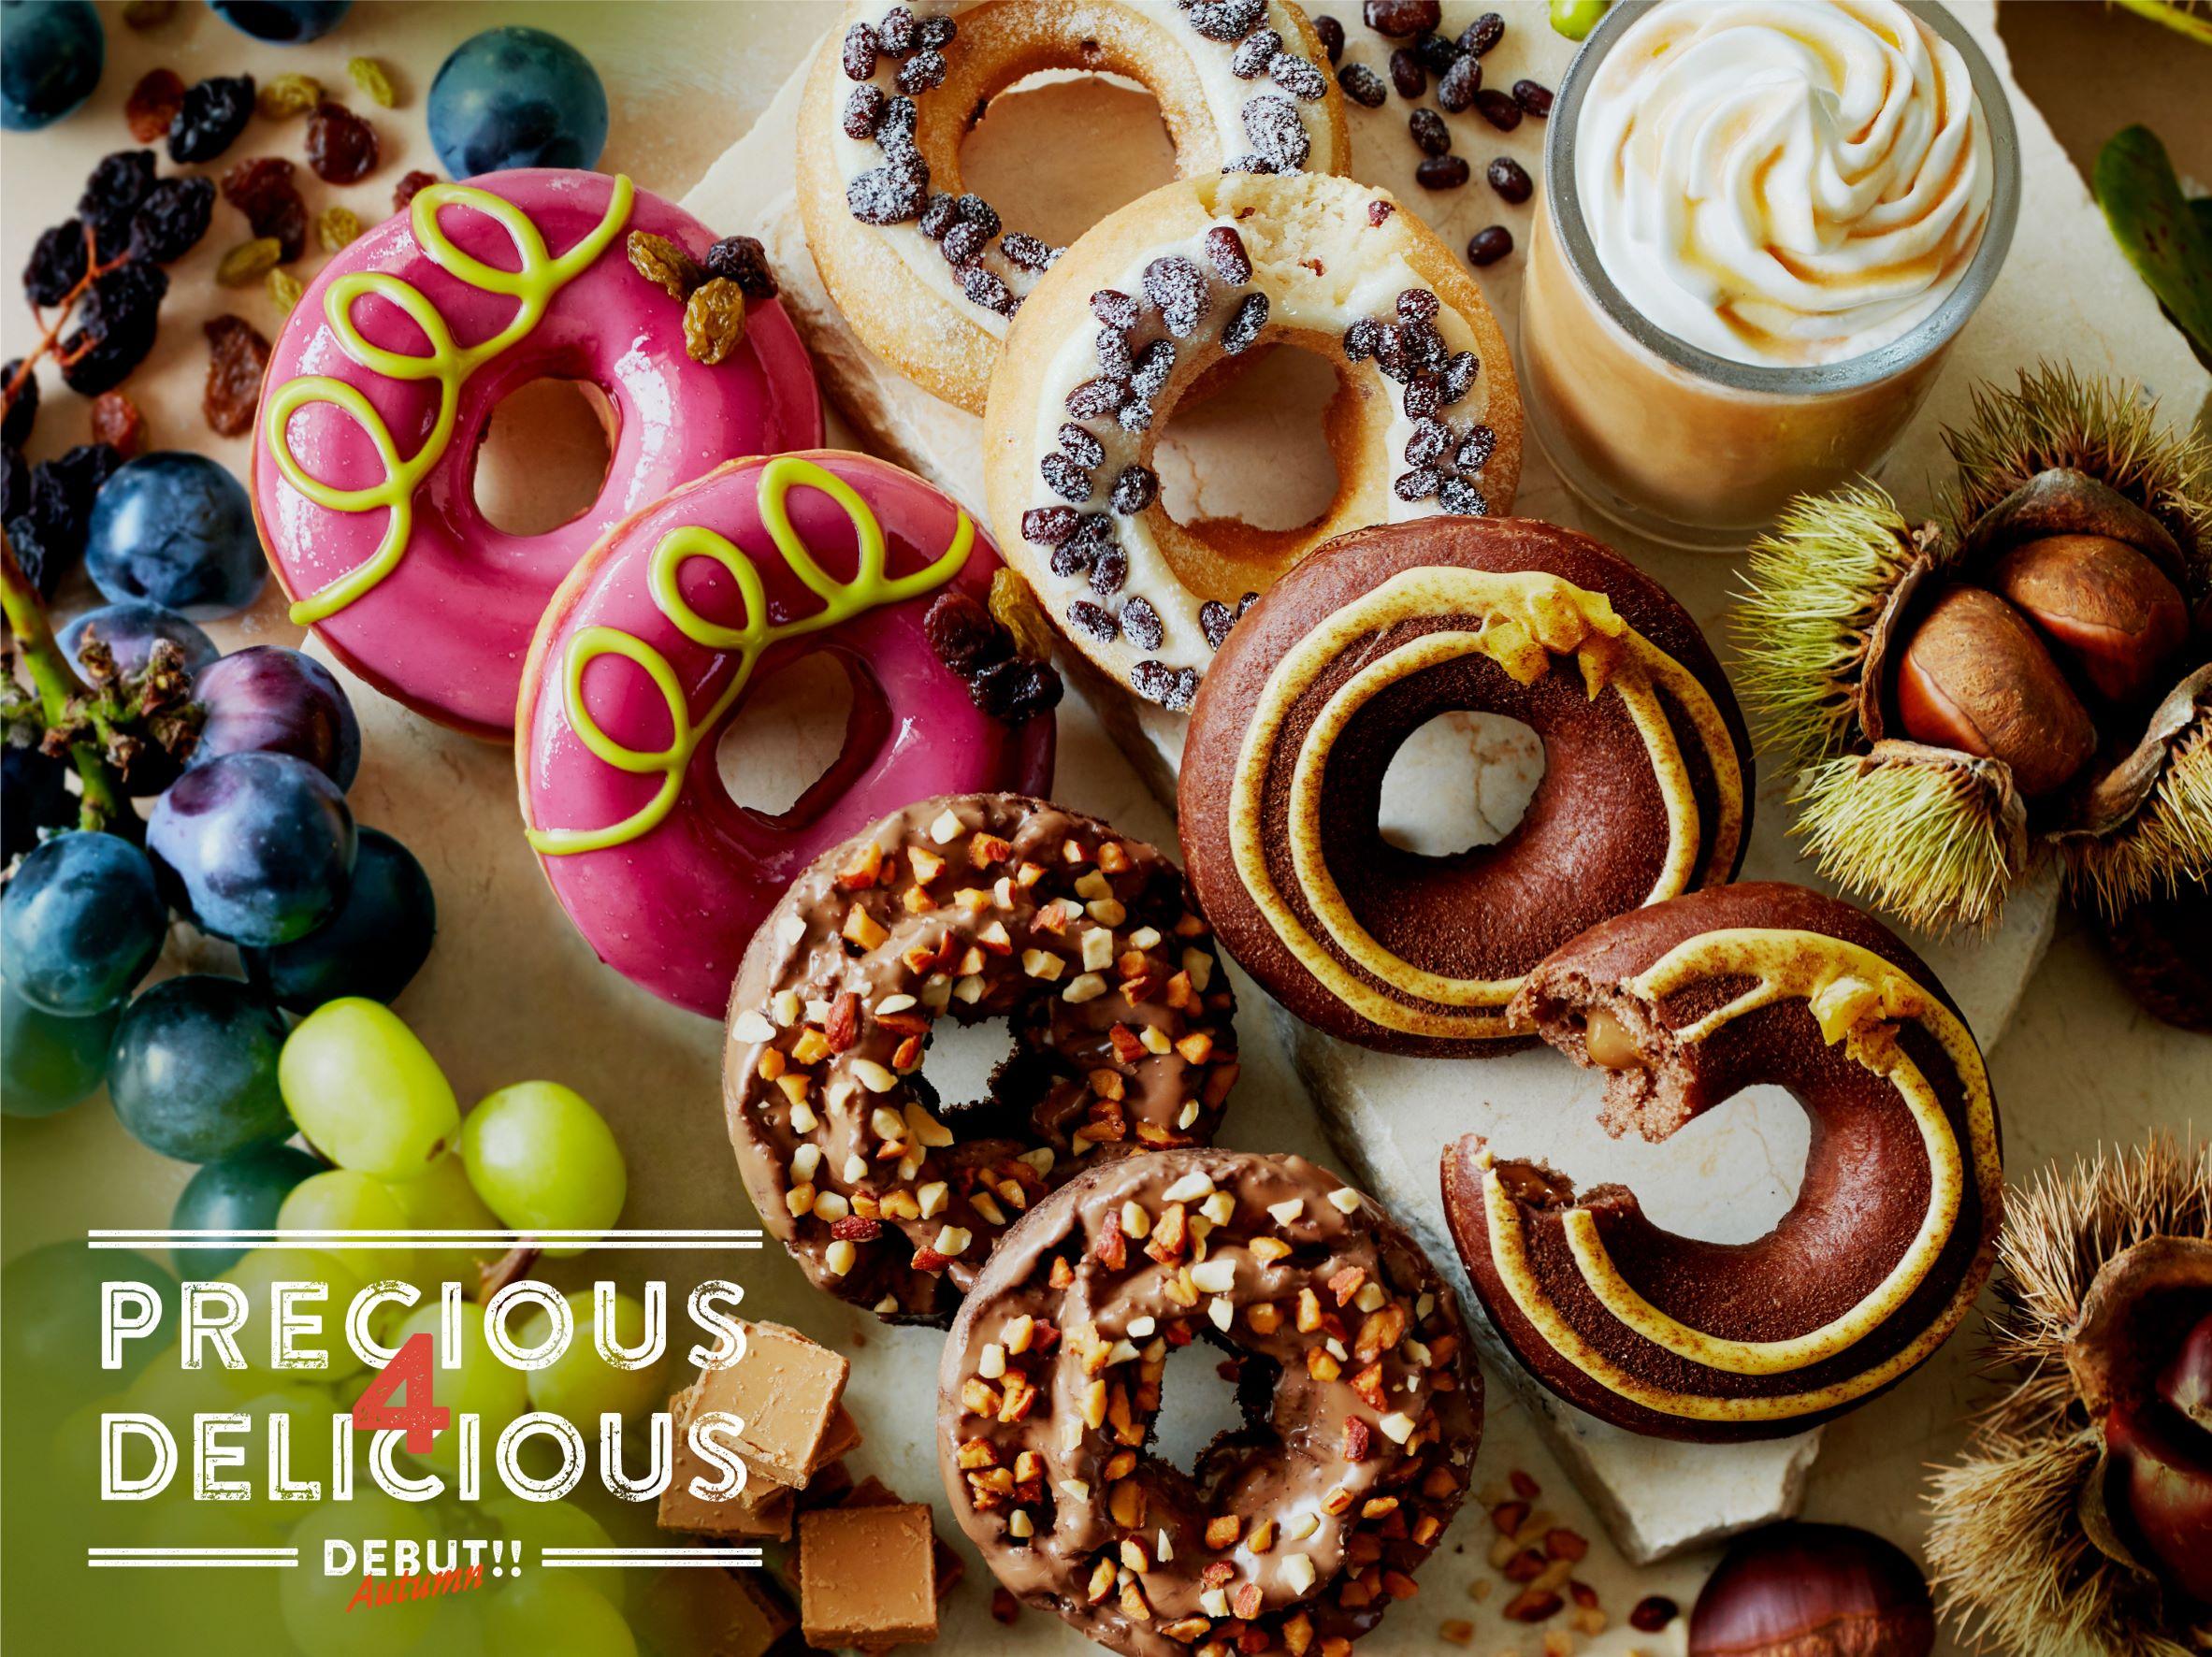 【KKDJ】食感にこだわった4種の秋の味覚を楽しむ『PRECIOUS 4 DELICIOUS』が発売!🥜🍇🍂🍁